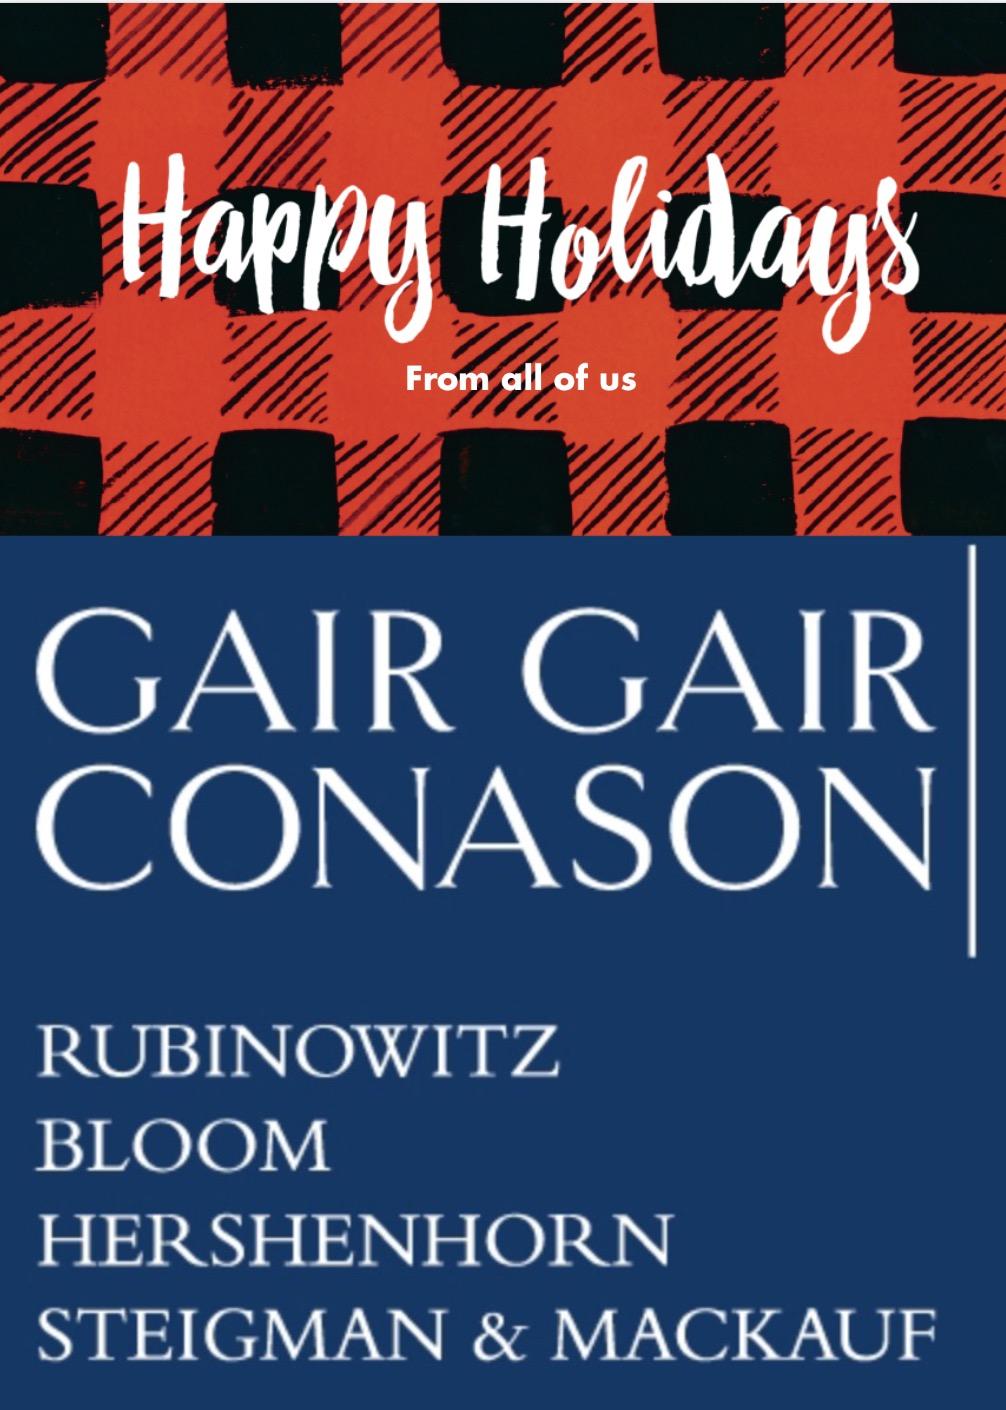 Gair Gair Happy Holidays 2015